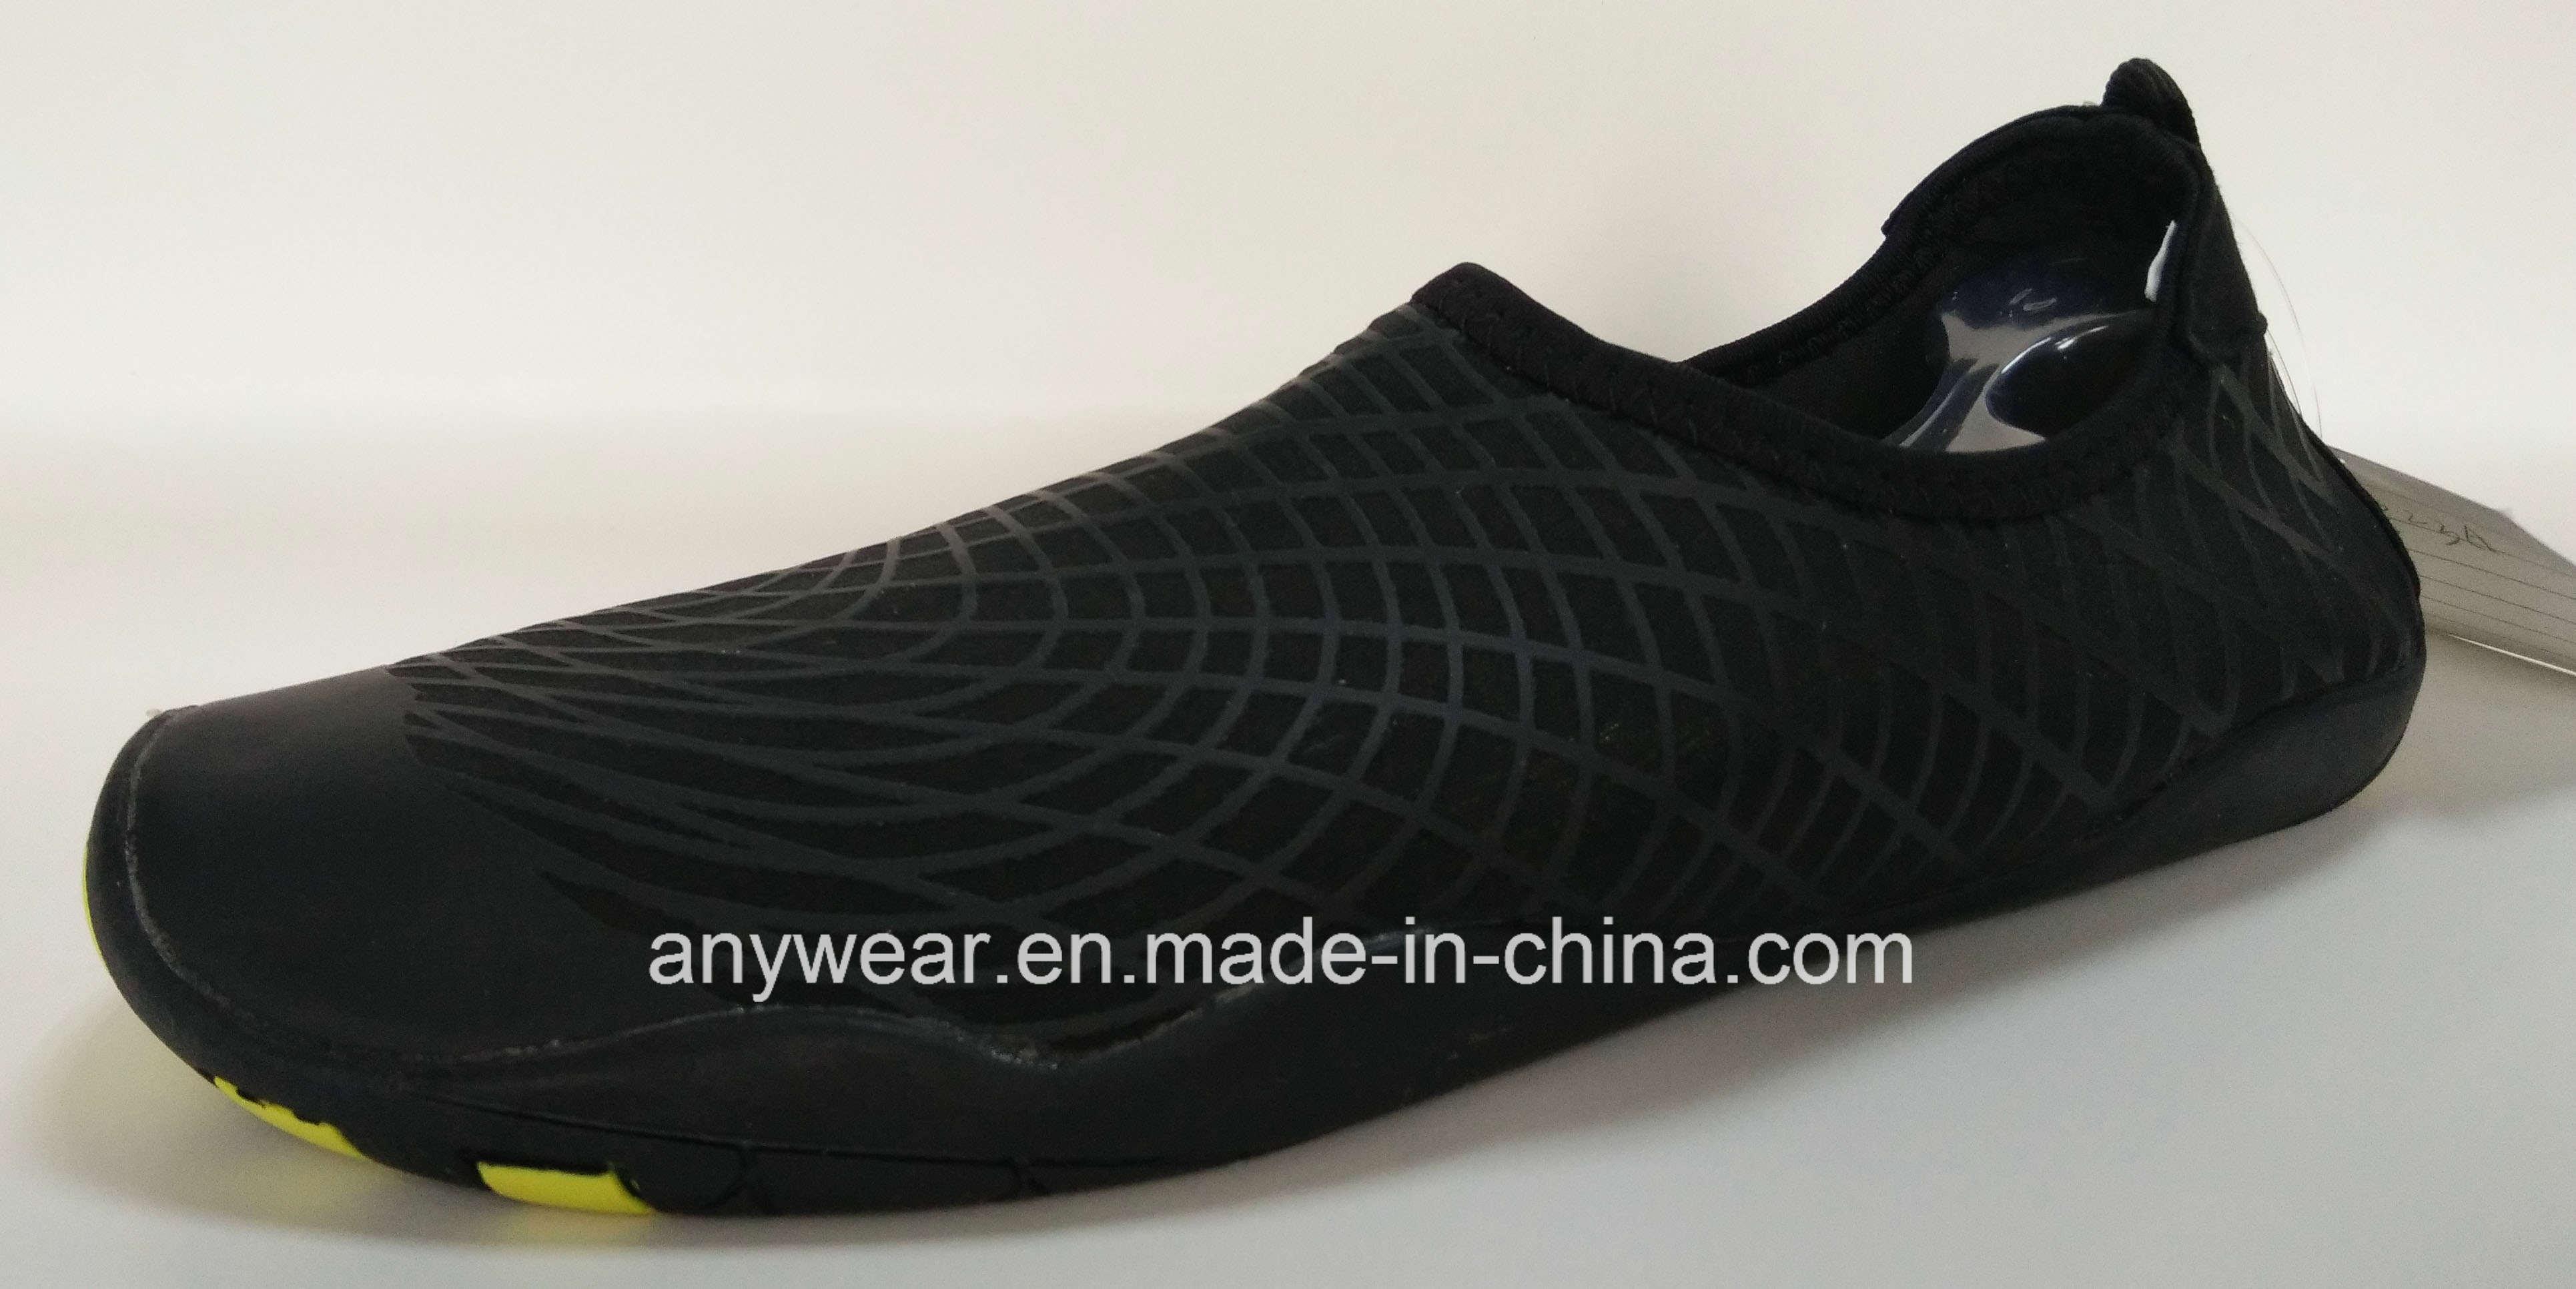 a52e3c201721 China Aqua Shoes Water Beach Sandal Shoes Five Finger Shoes for Men and  Women (138) - China Shoes